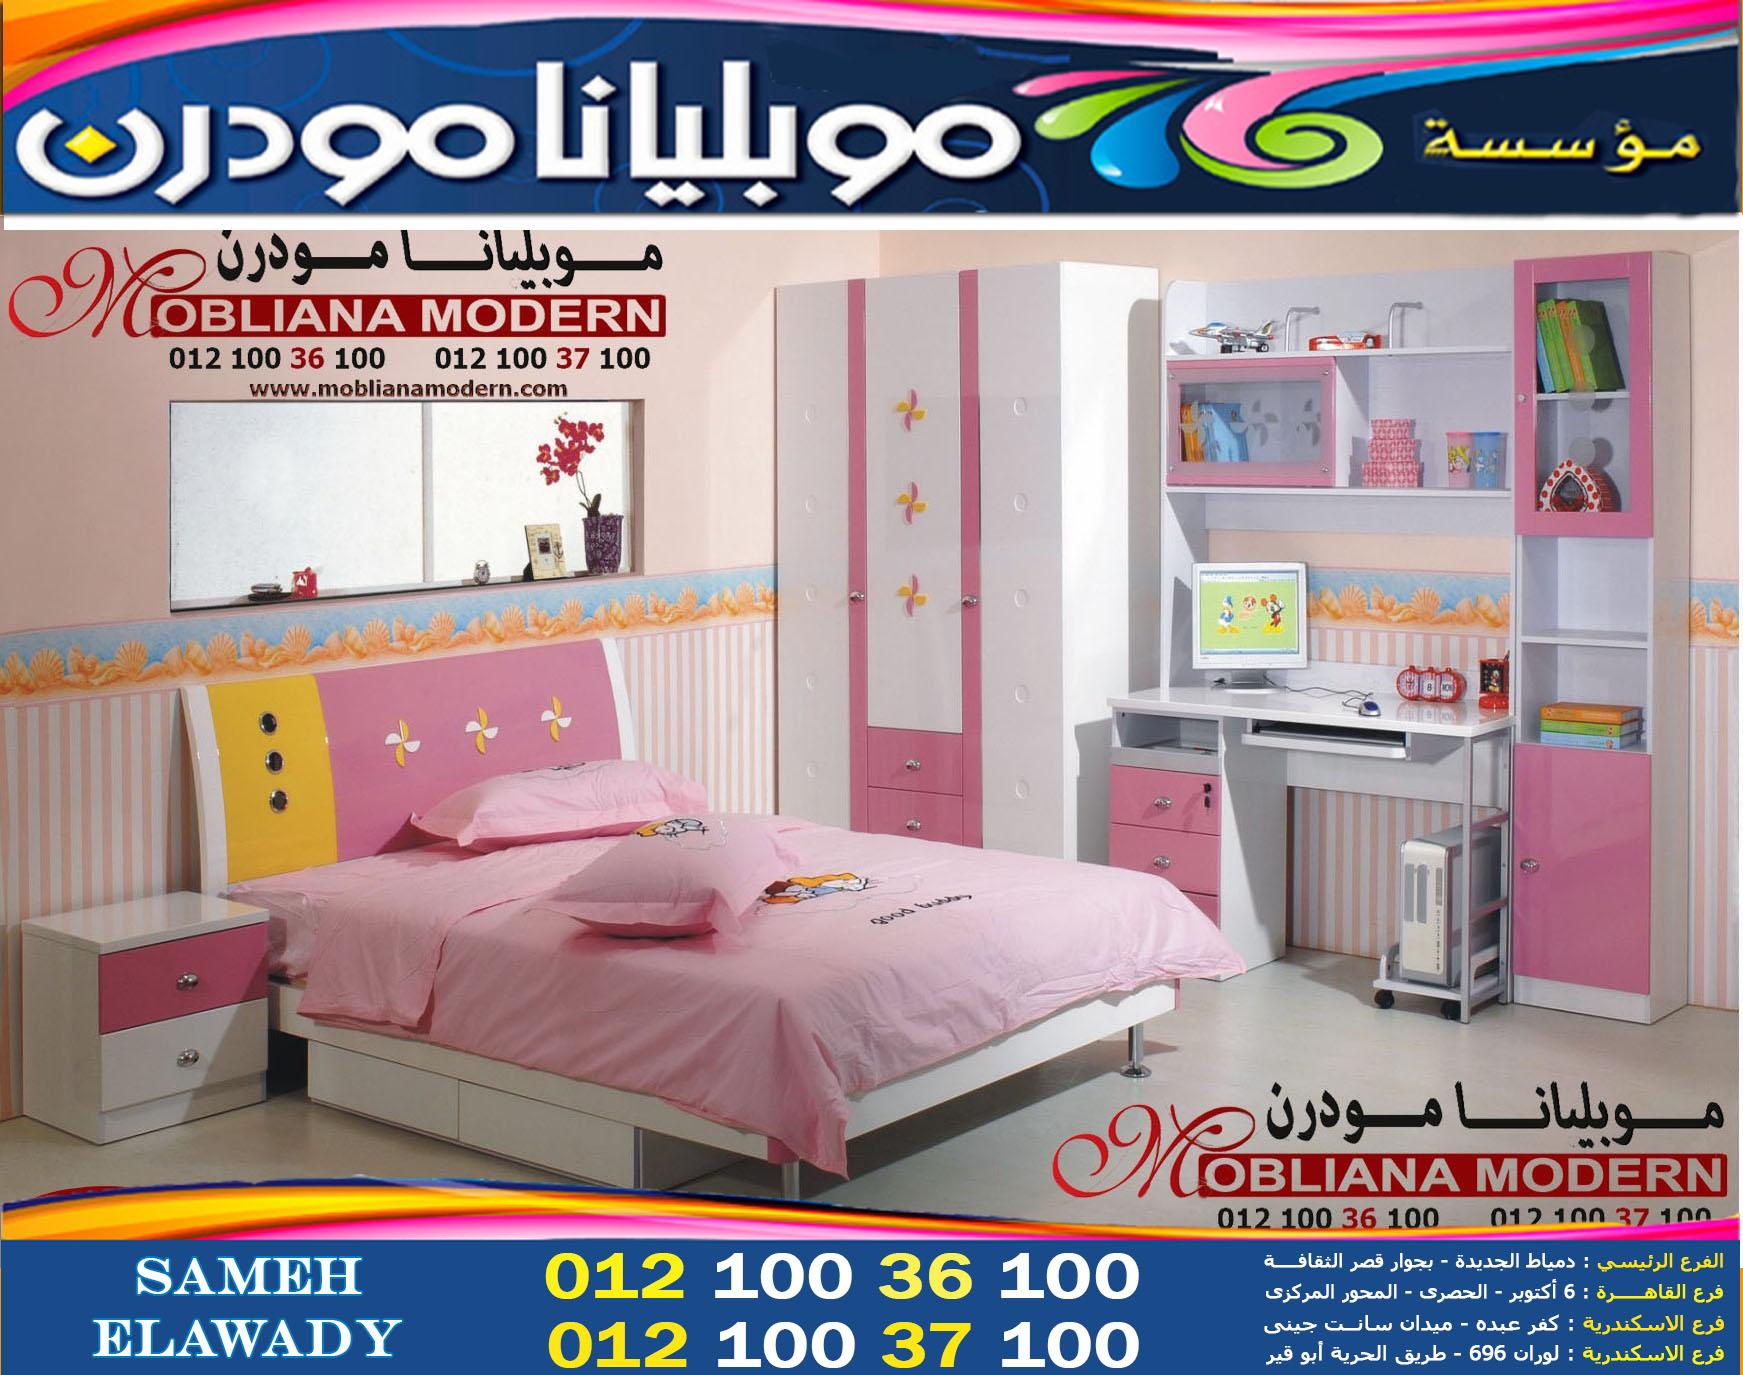 معارض غرف اطفال 2021 - اماكن معارض اوض اطفال مودرن دمياط 2022 P_175902q5s3